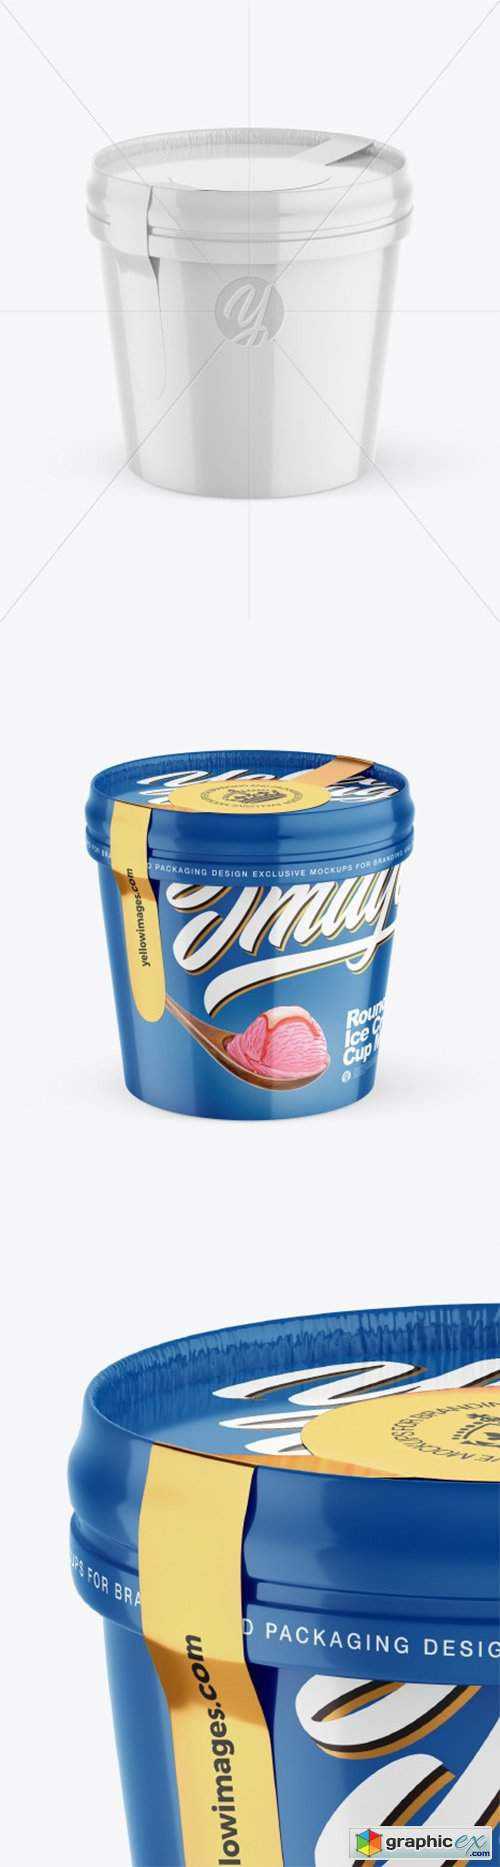 Glossy Ice Cream Cup Mockup 50821